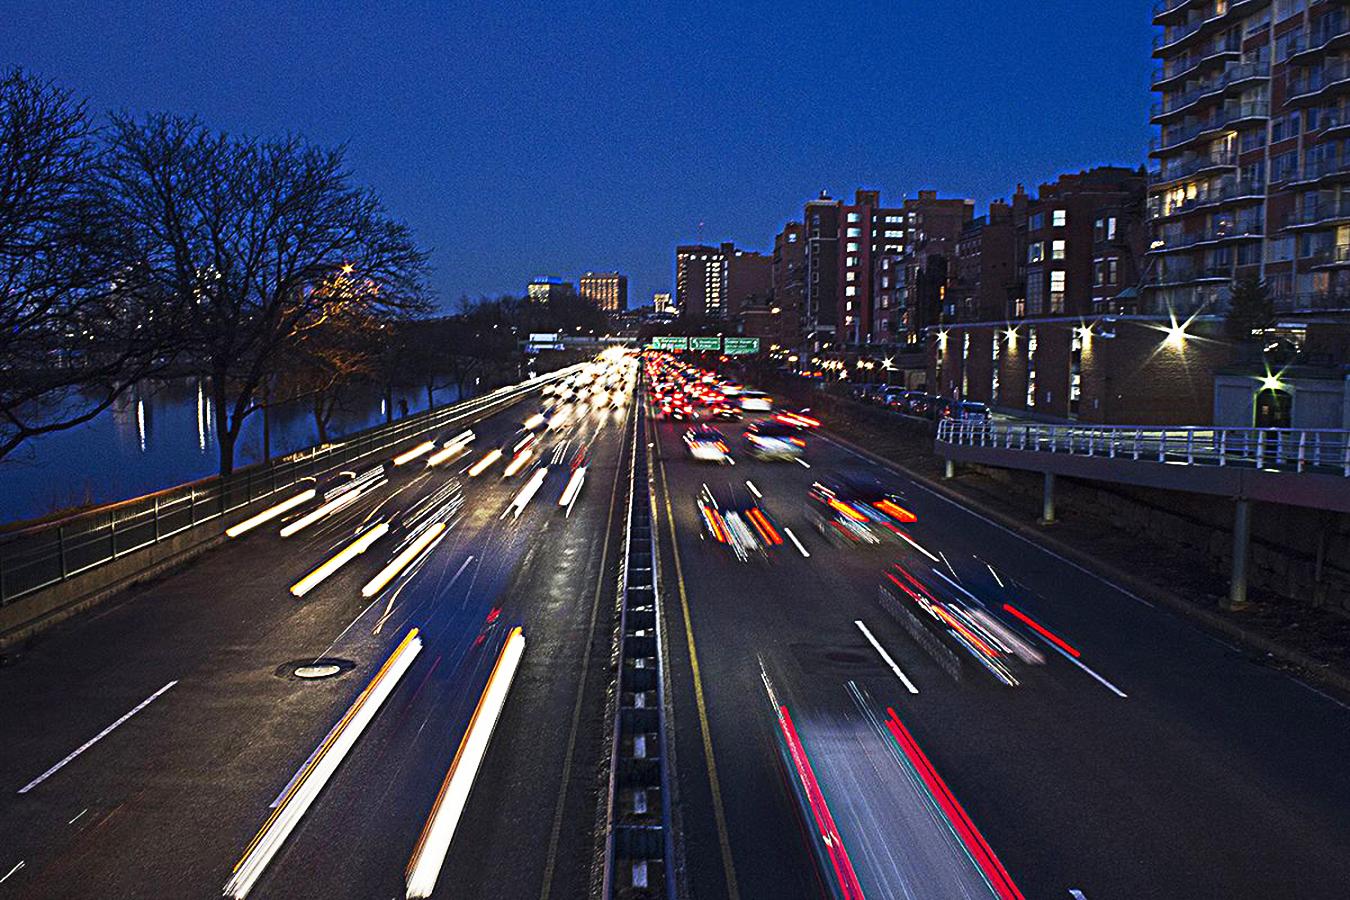 Tony_Ward_Studio_photo_David_Pang_Boston_cars-car-evening_rush_hour